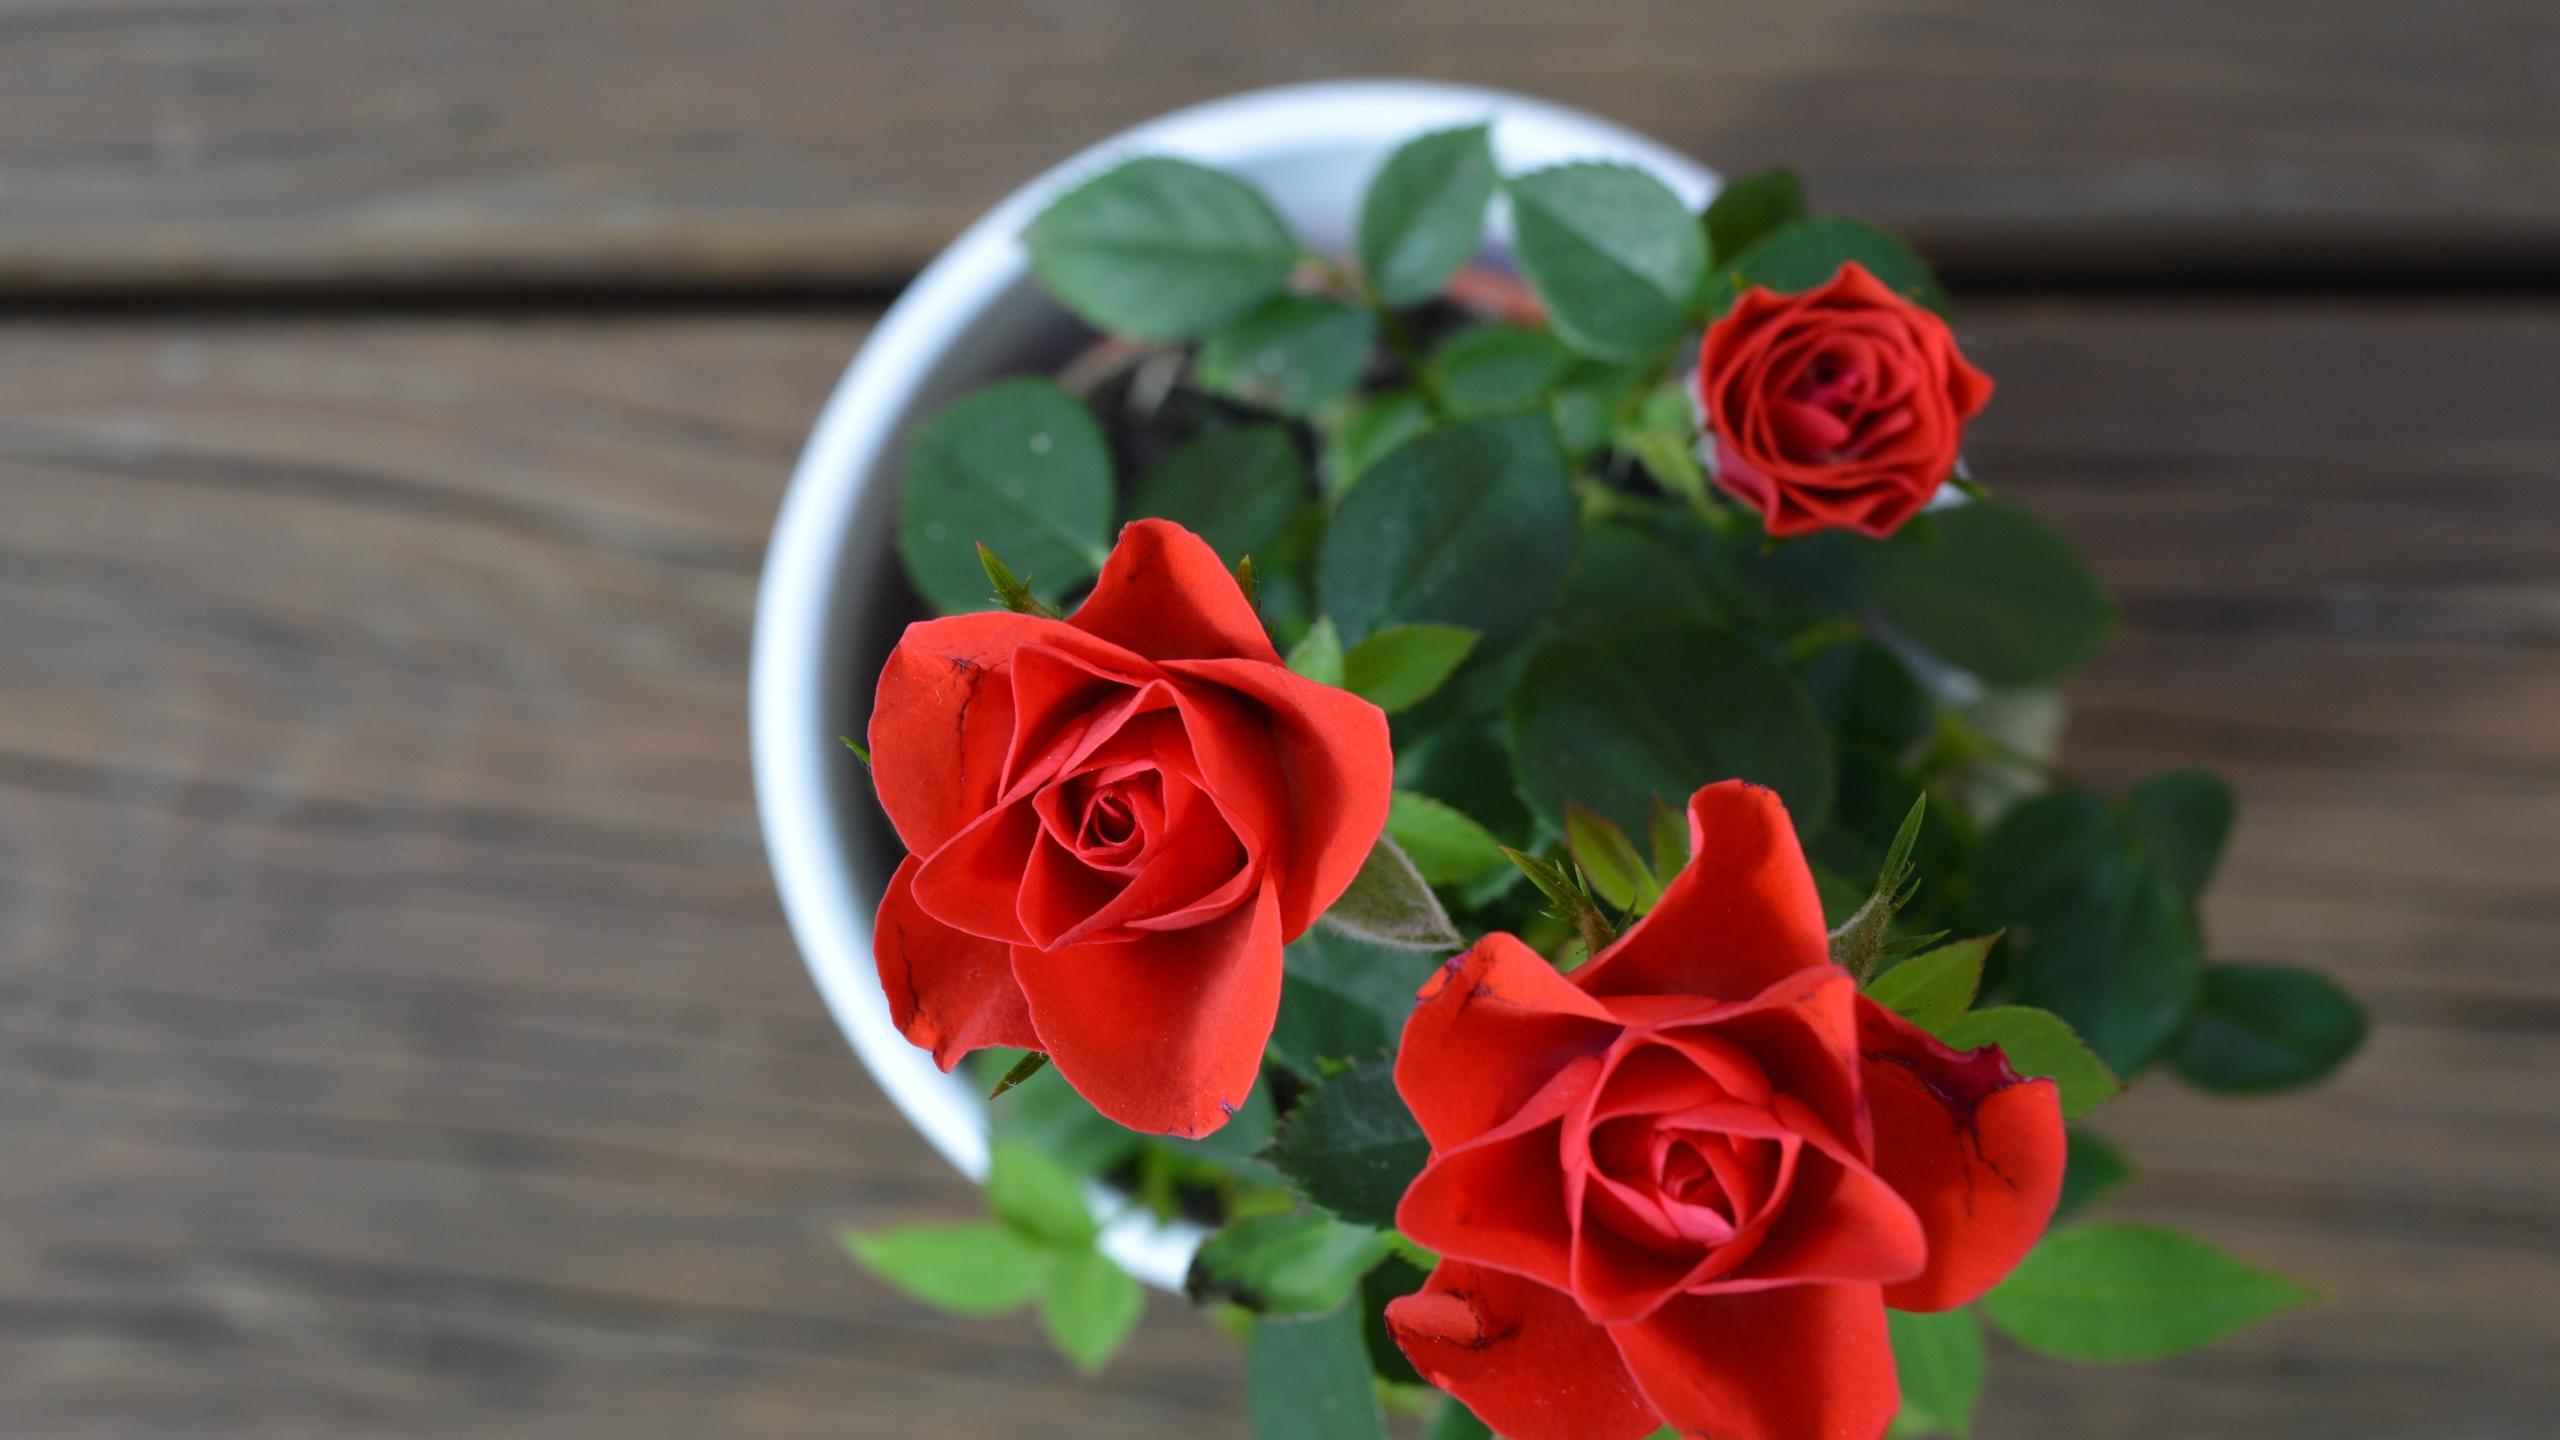 розы, листья, ваза, фон